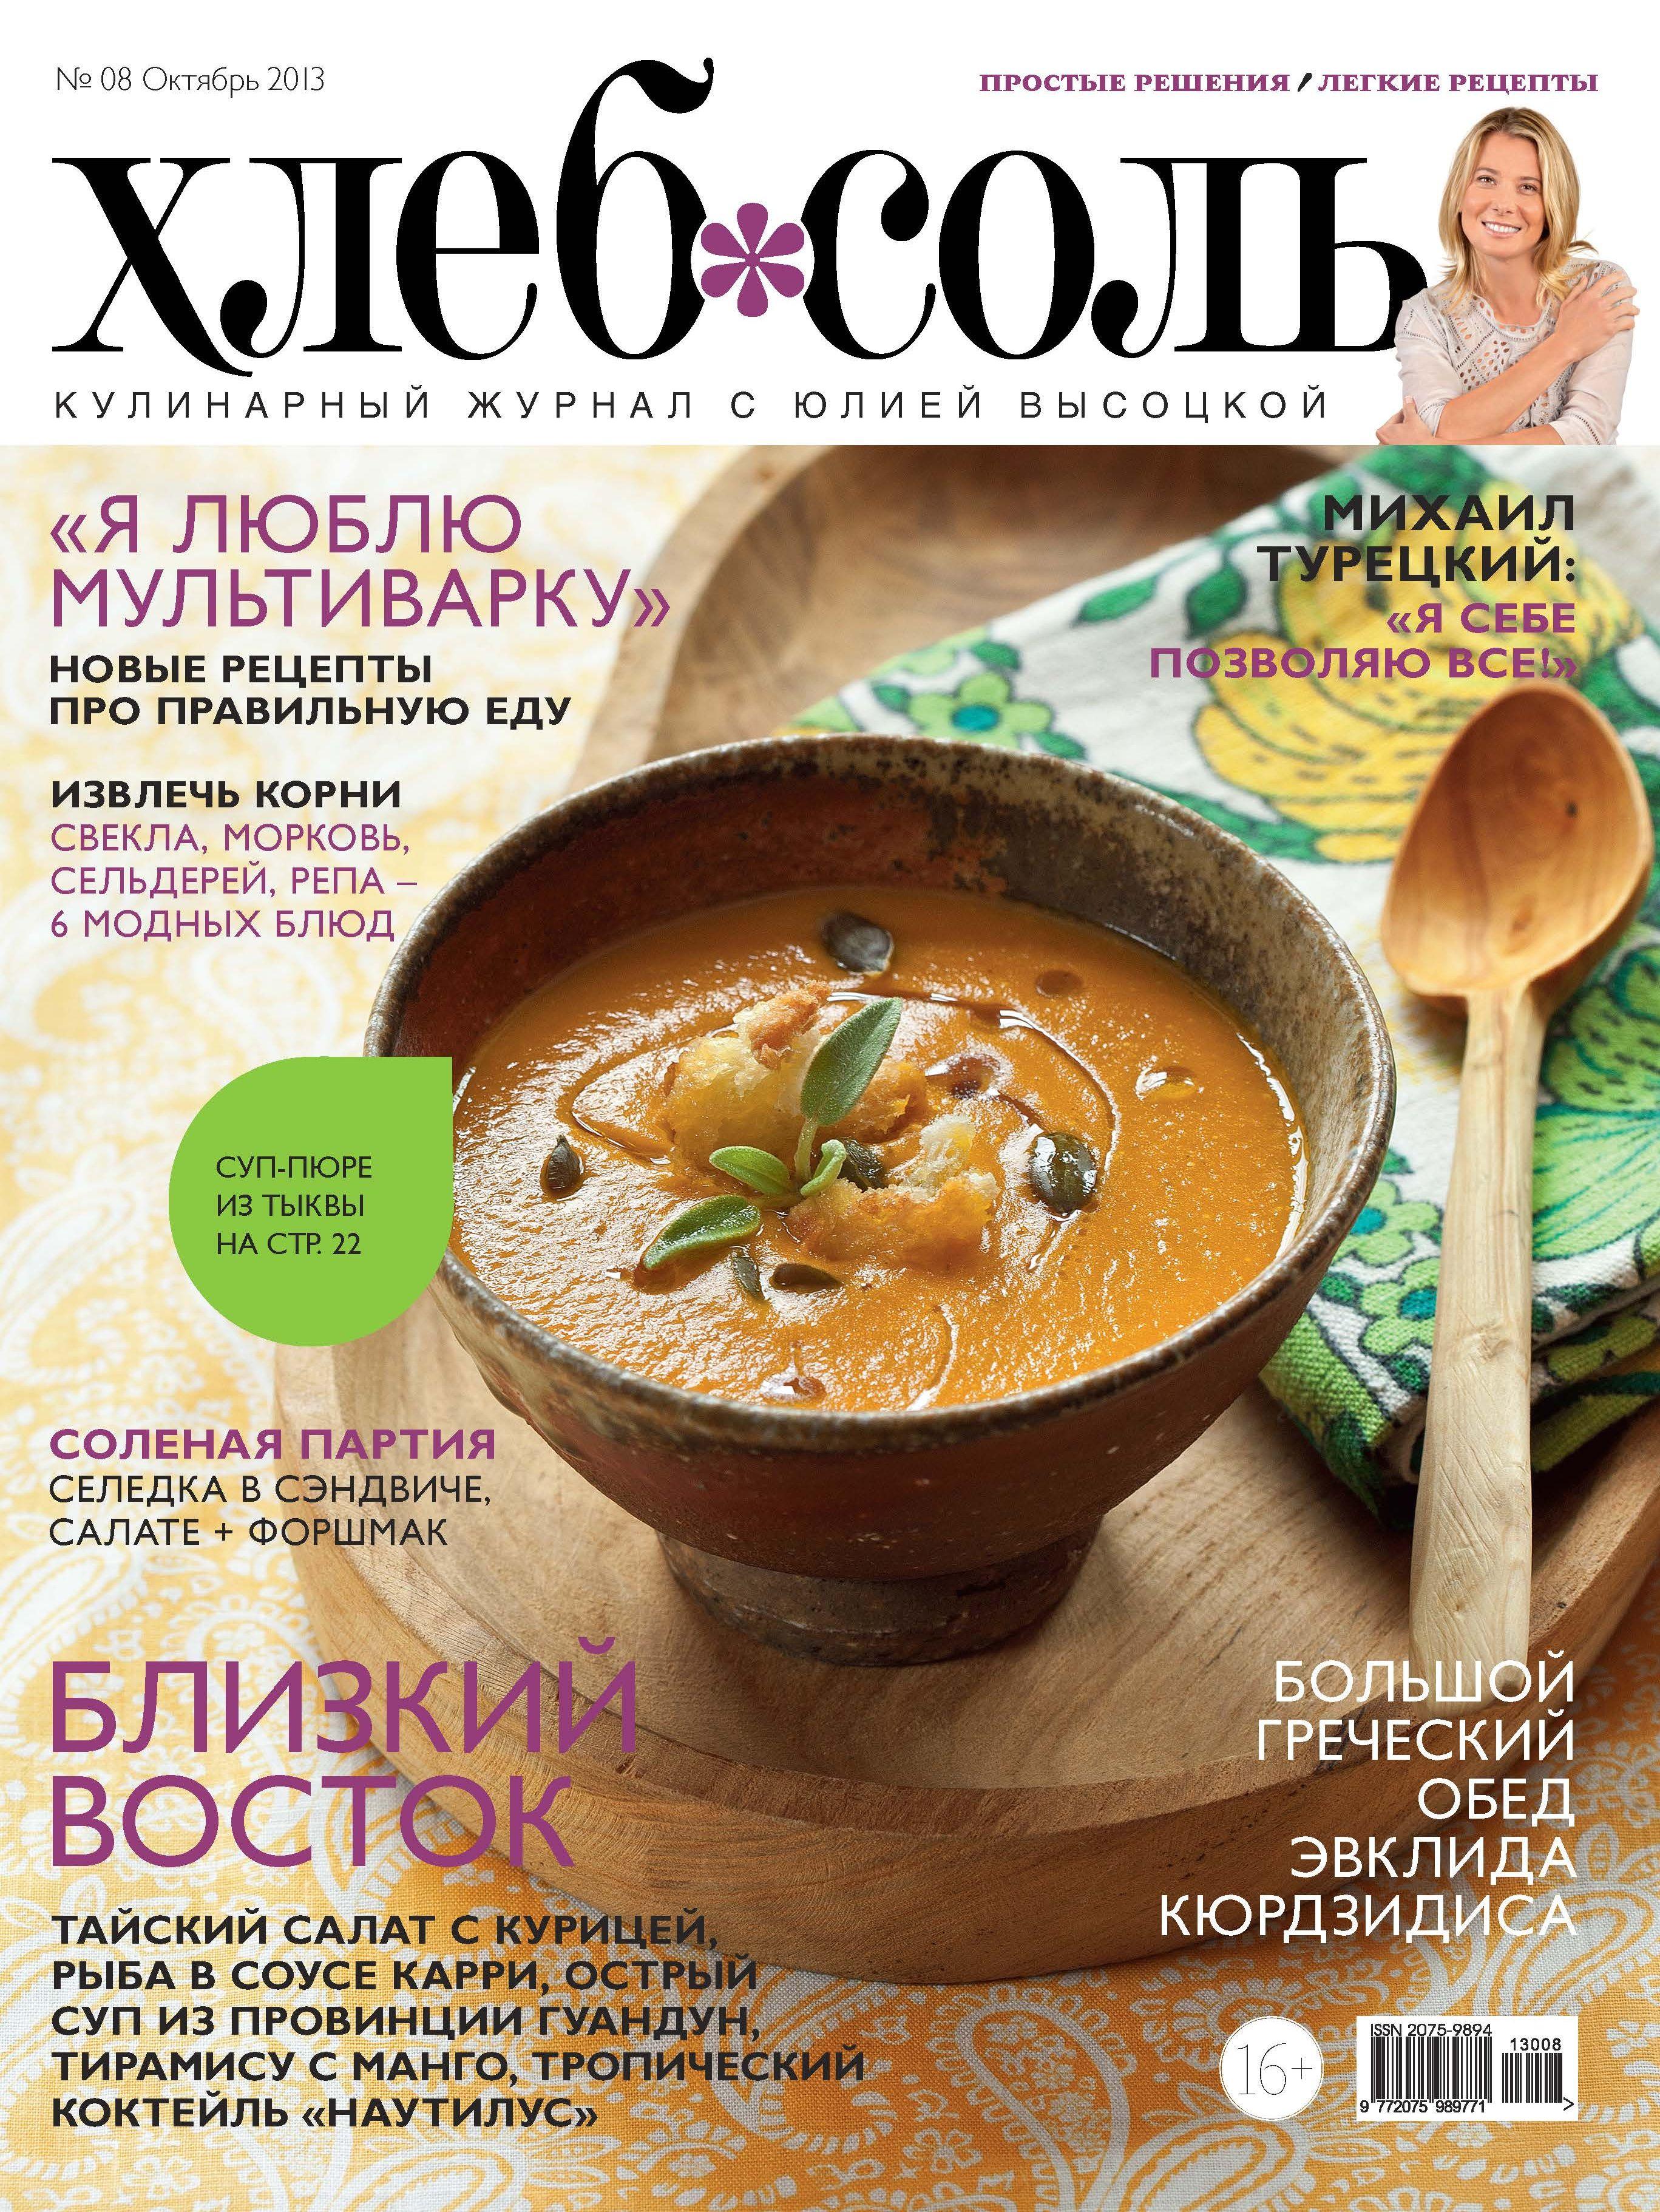 ХлебСоль, № 8, октябрь 2013